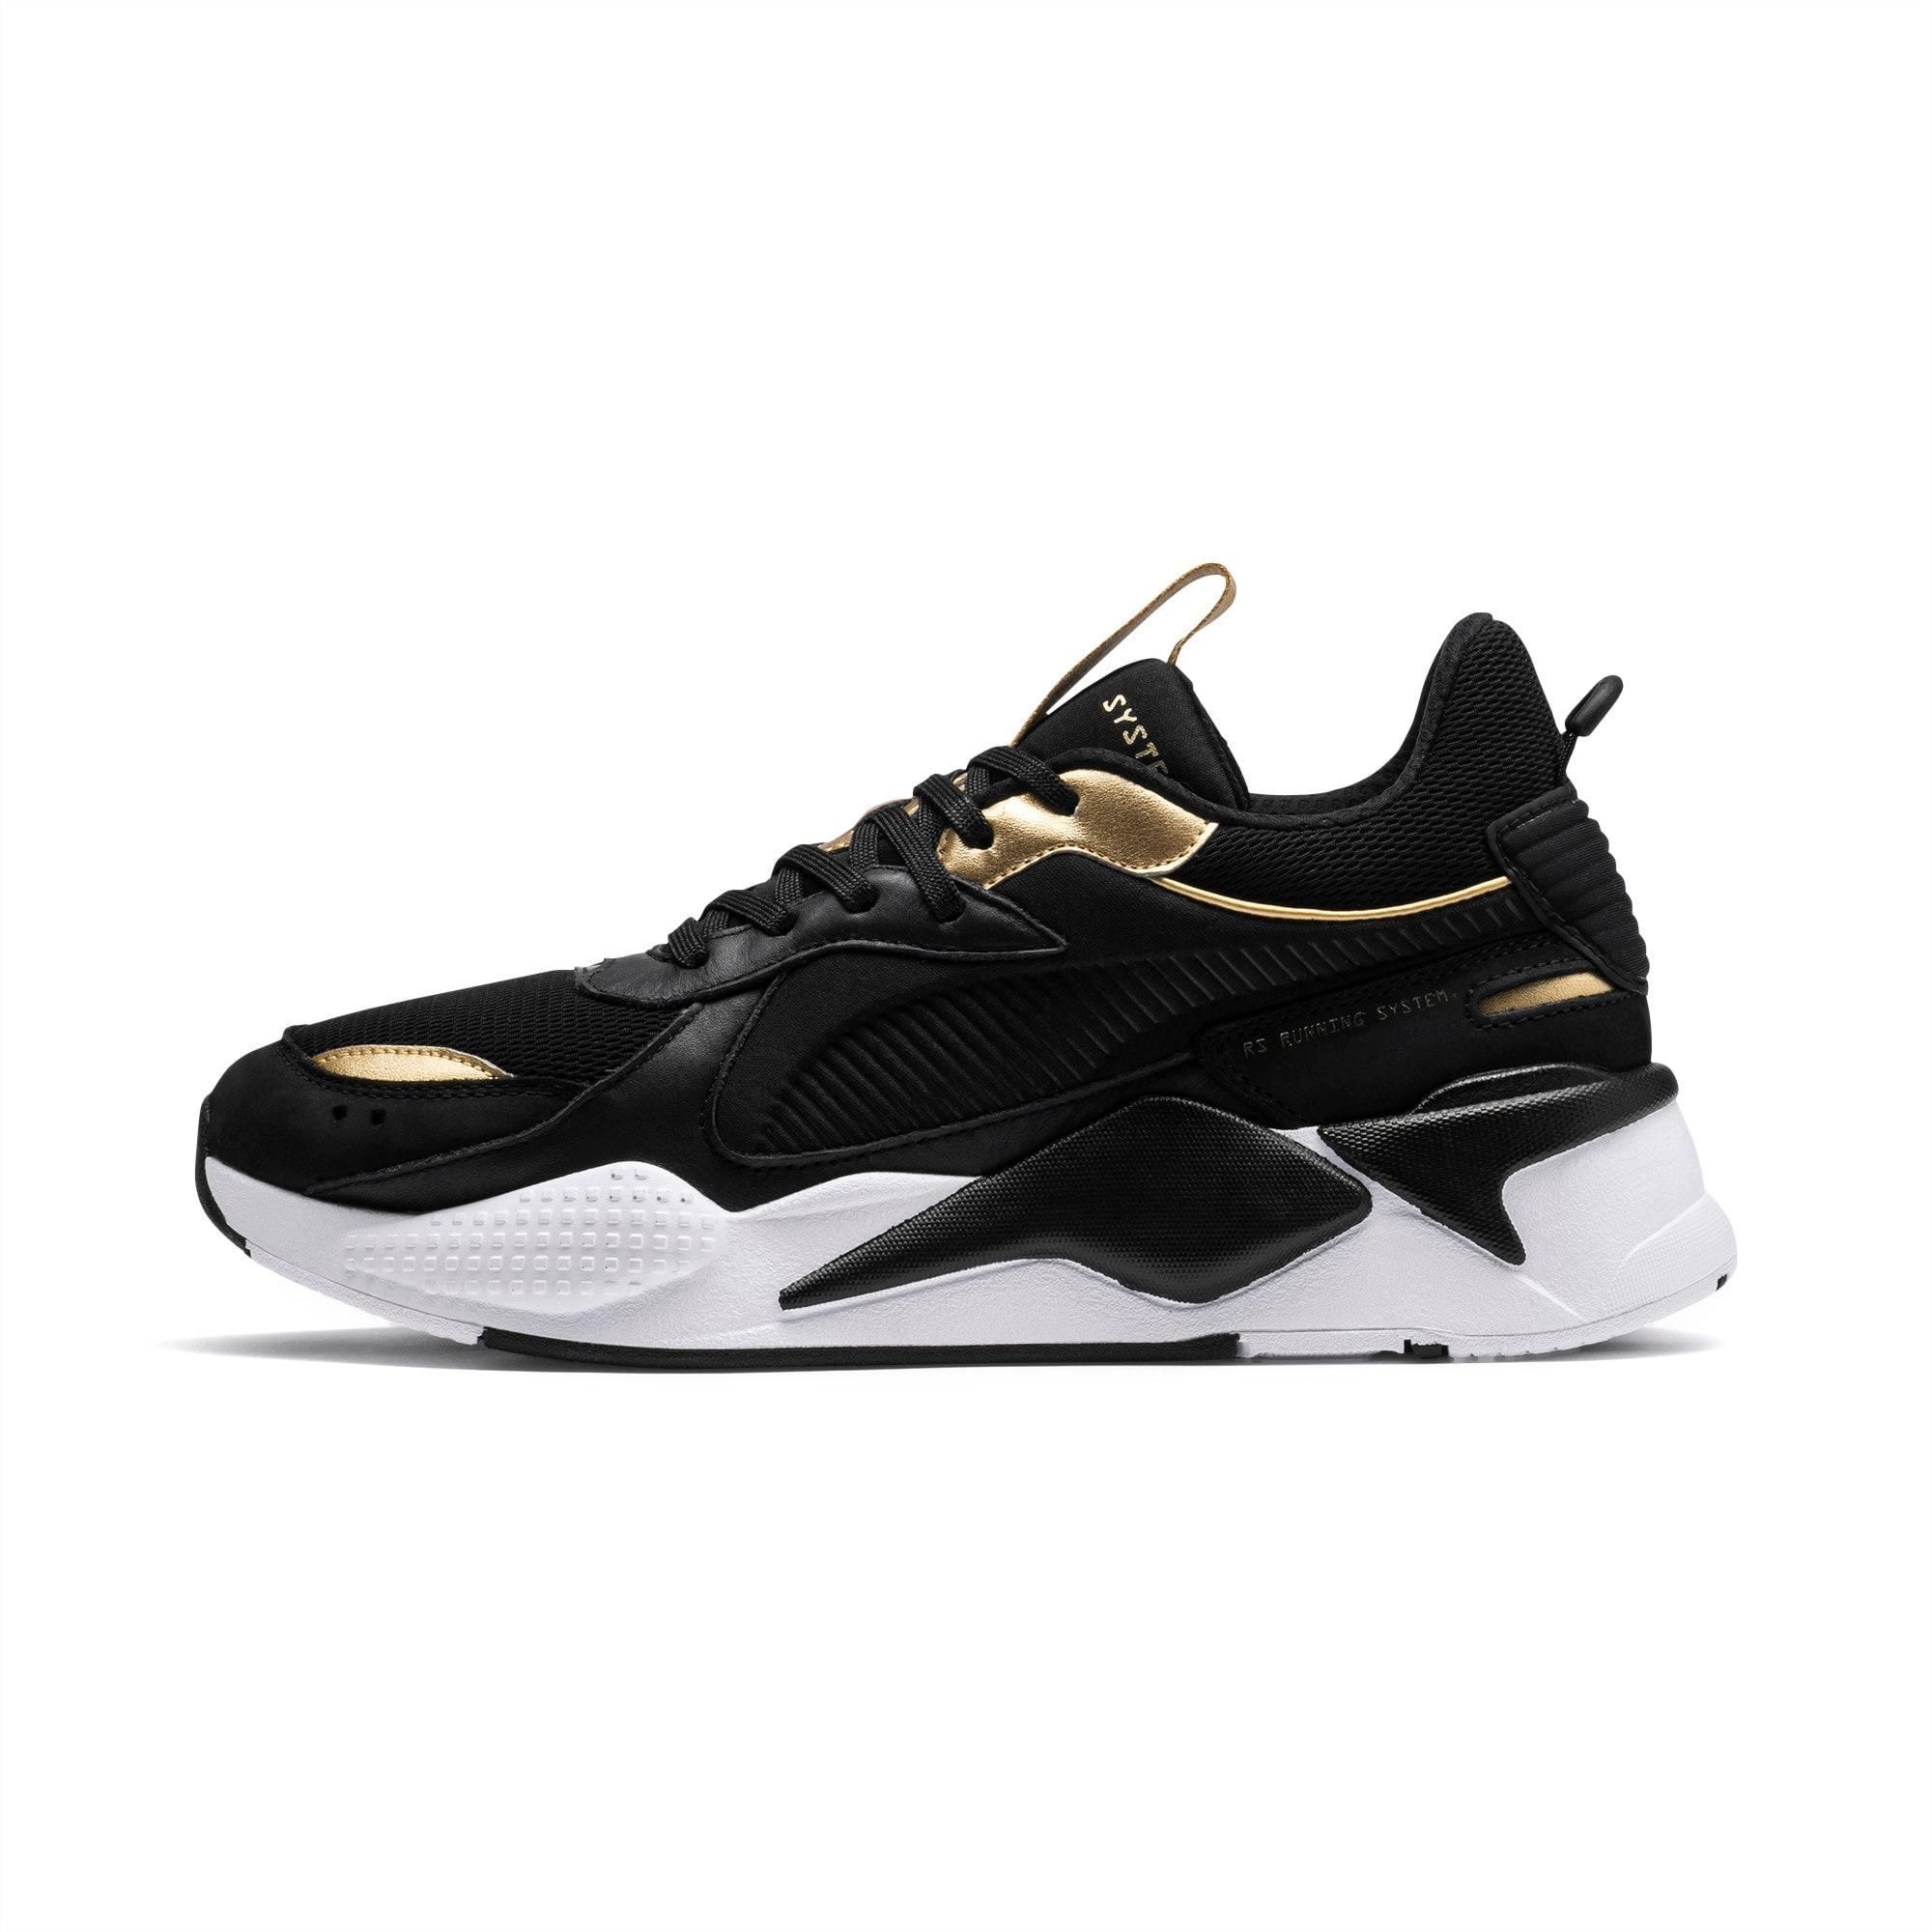 bala Poderoso a la deriva  RS-X TROPHY Shoes | Puma Black-Puma Team Gold | PUMA Low | PUMA